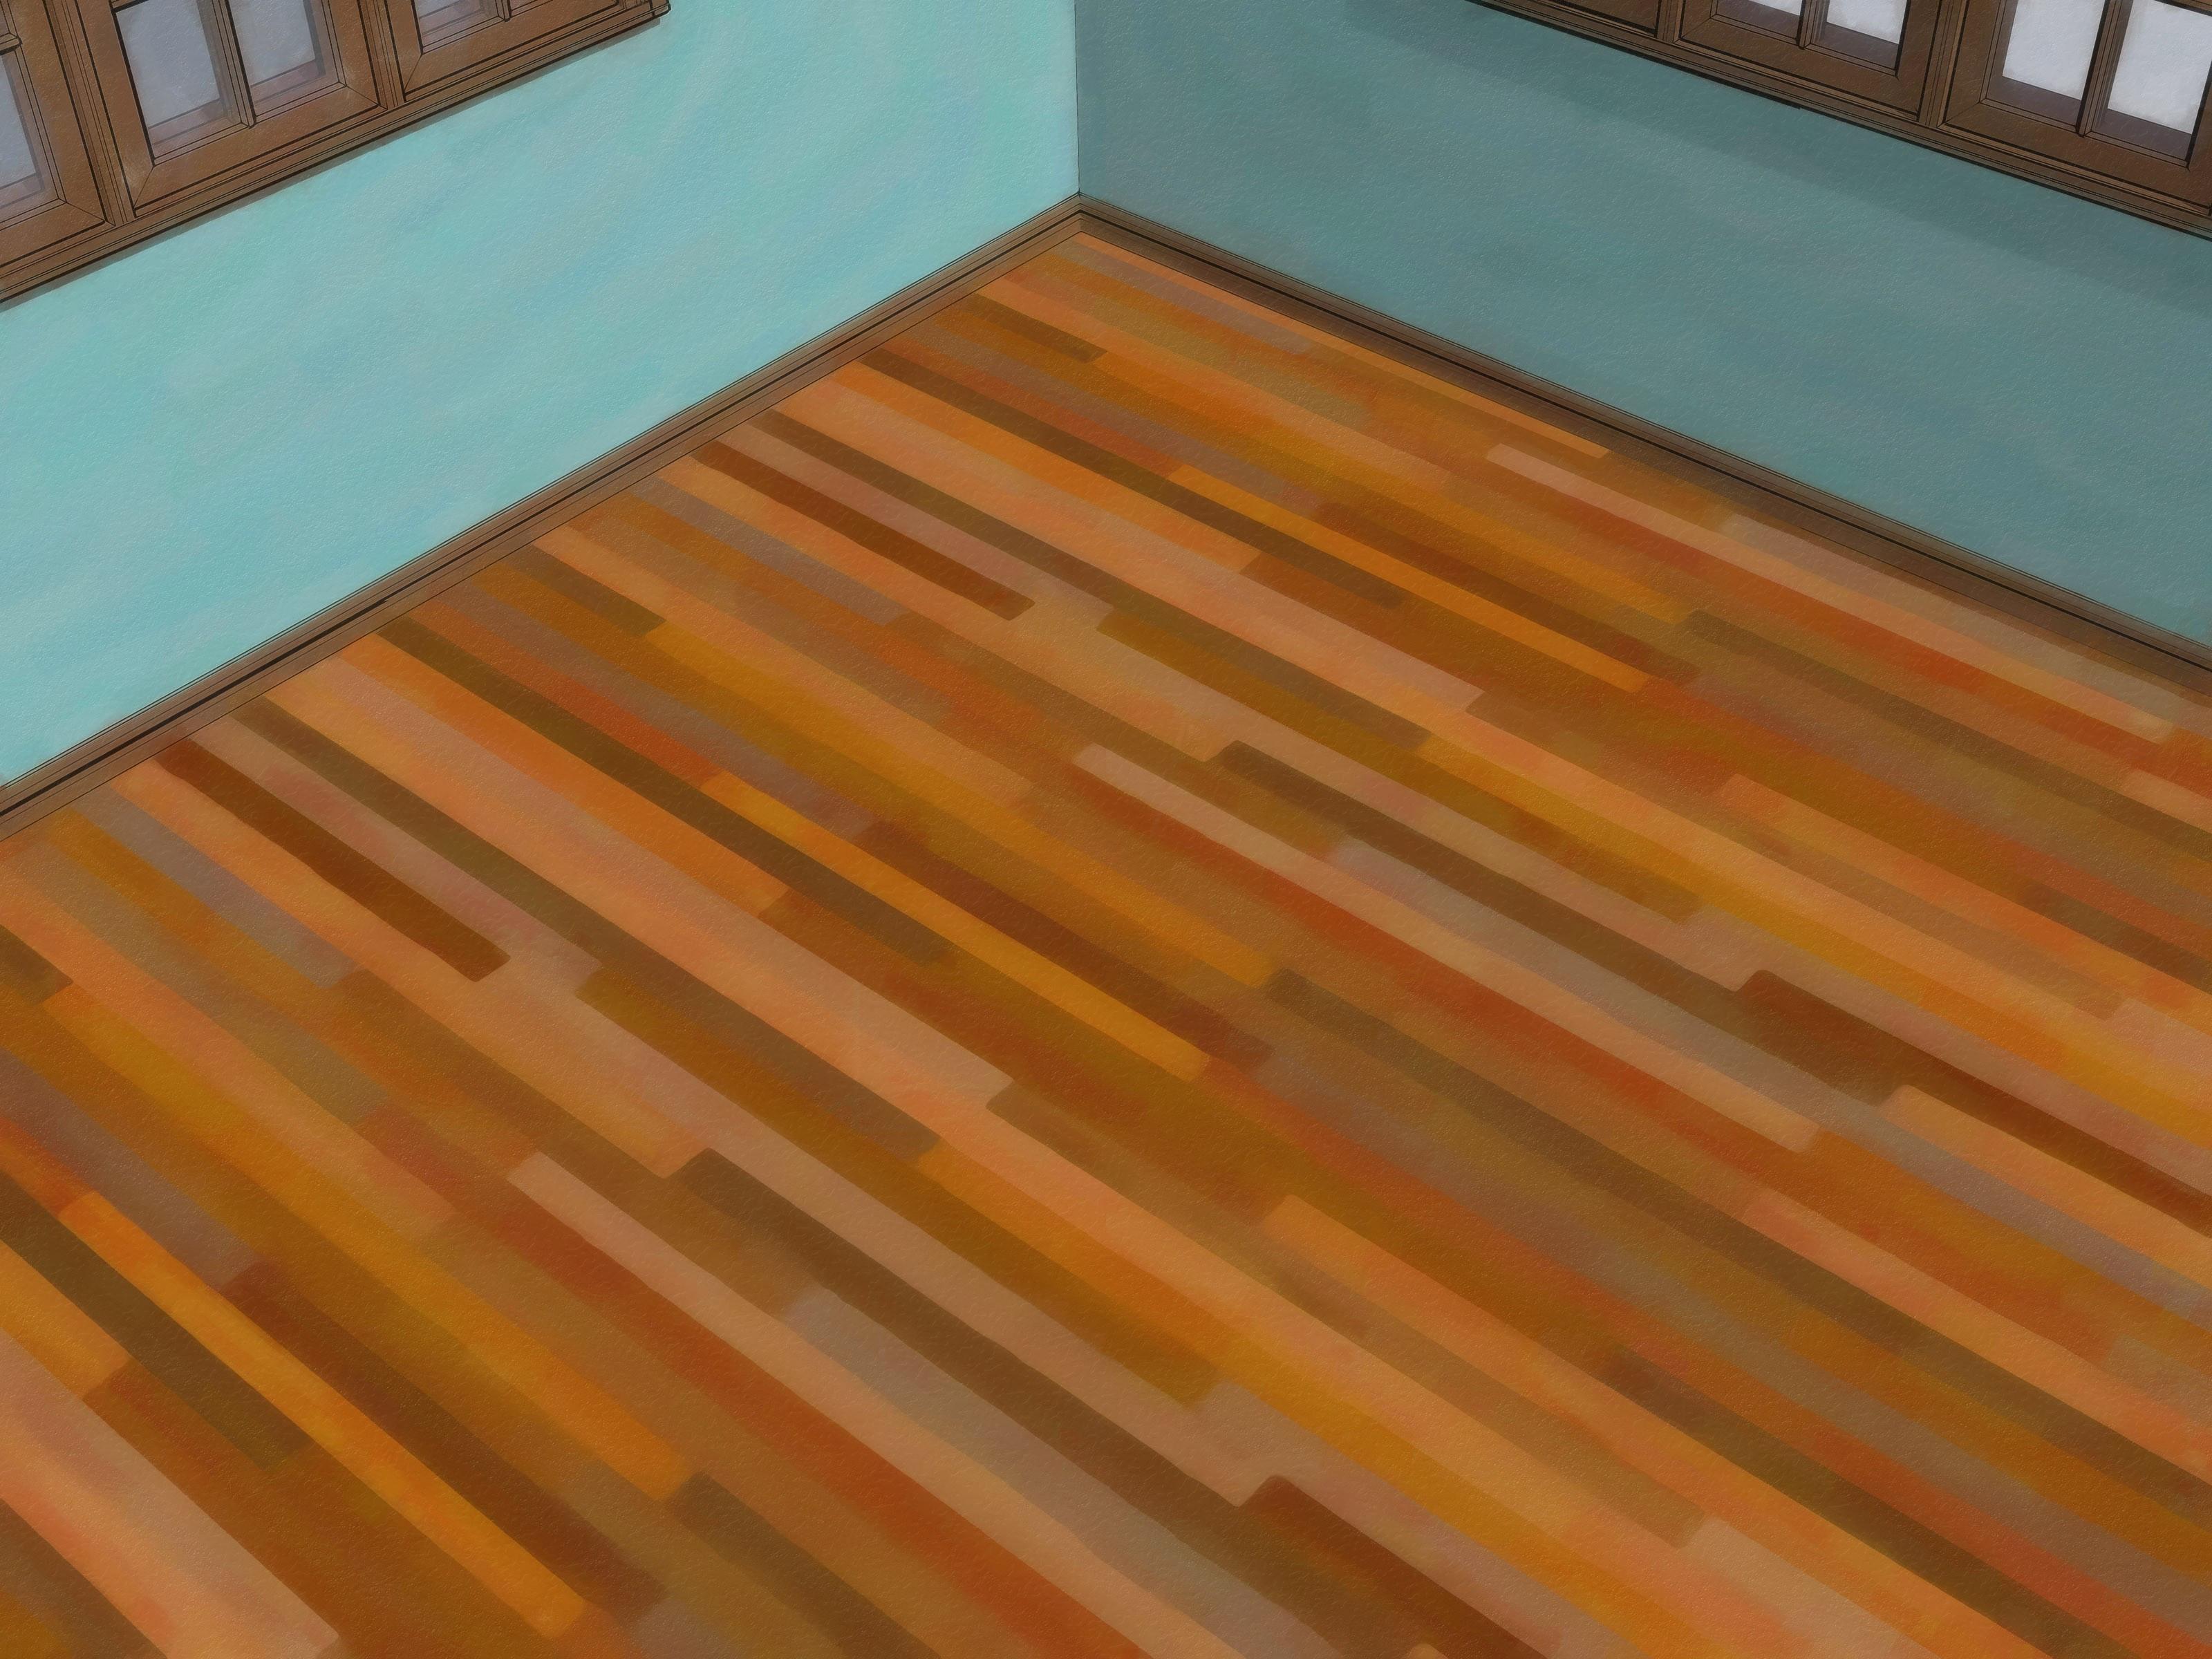 how to make hardwood floors shine of 16 fresh hardwood floor polish photos dizpos com regarding hardwood floor polish unique 50 inspirational sanding and refinishing hardwood floors graphics pics of 16 fresh